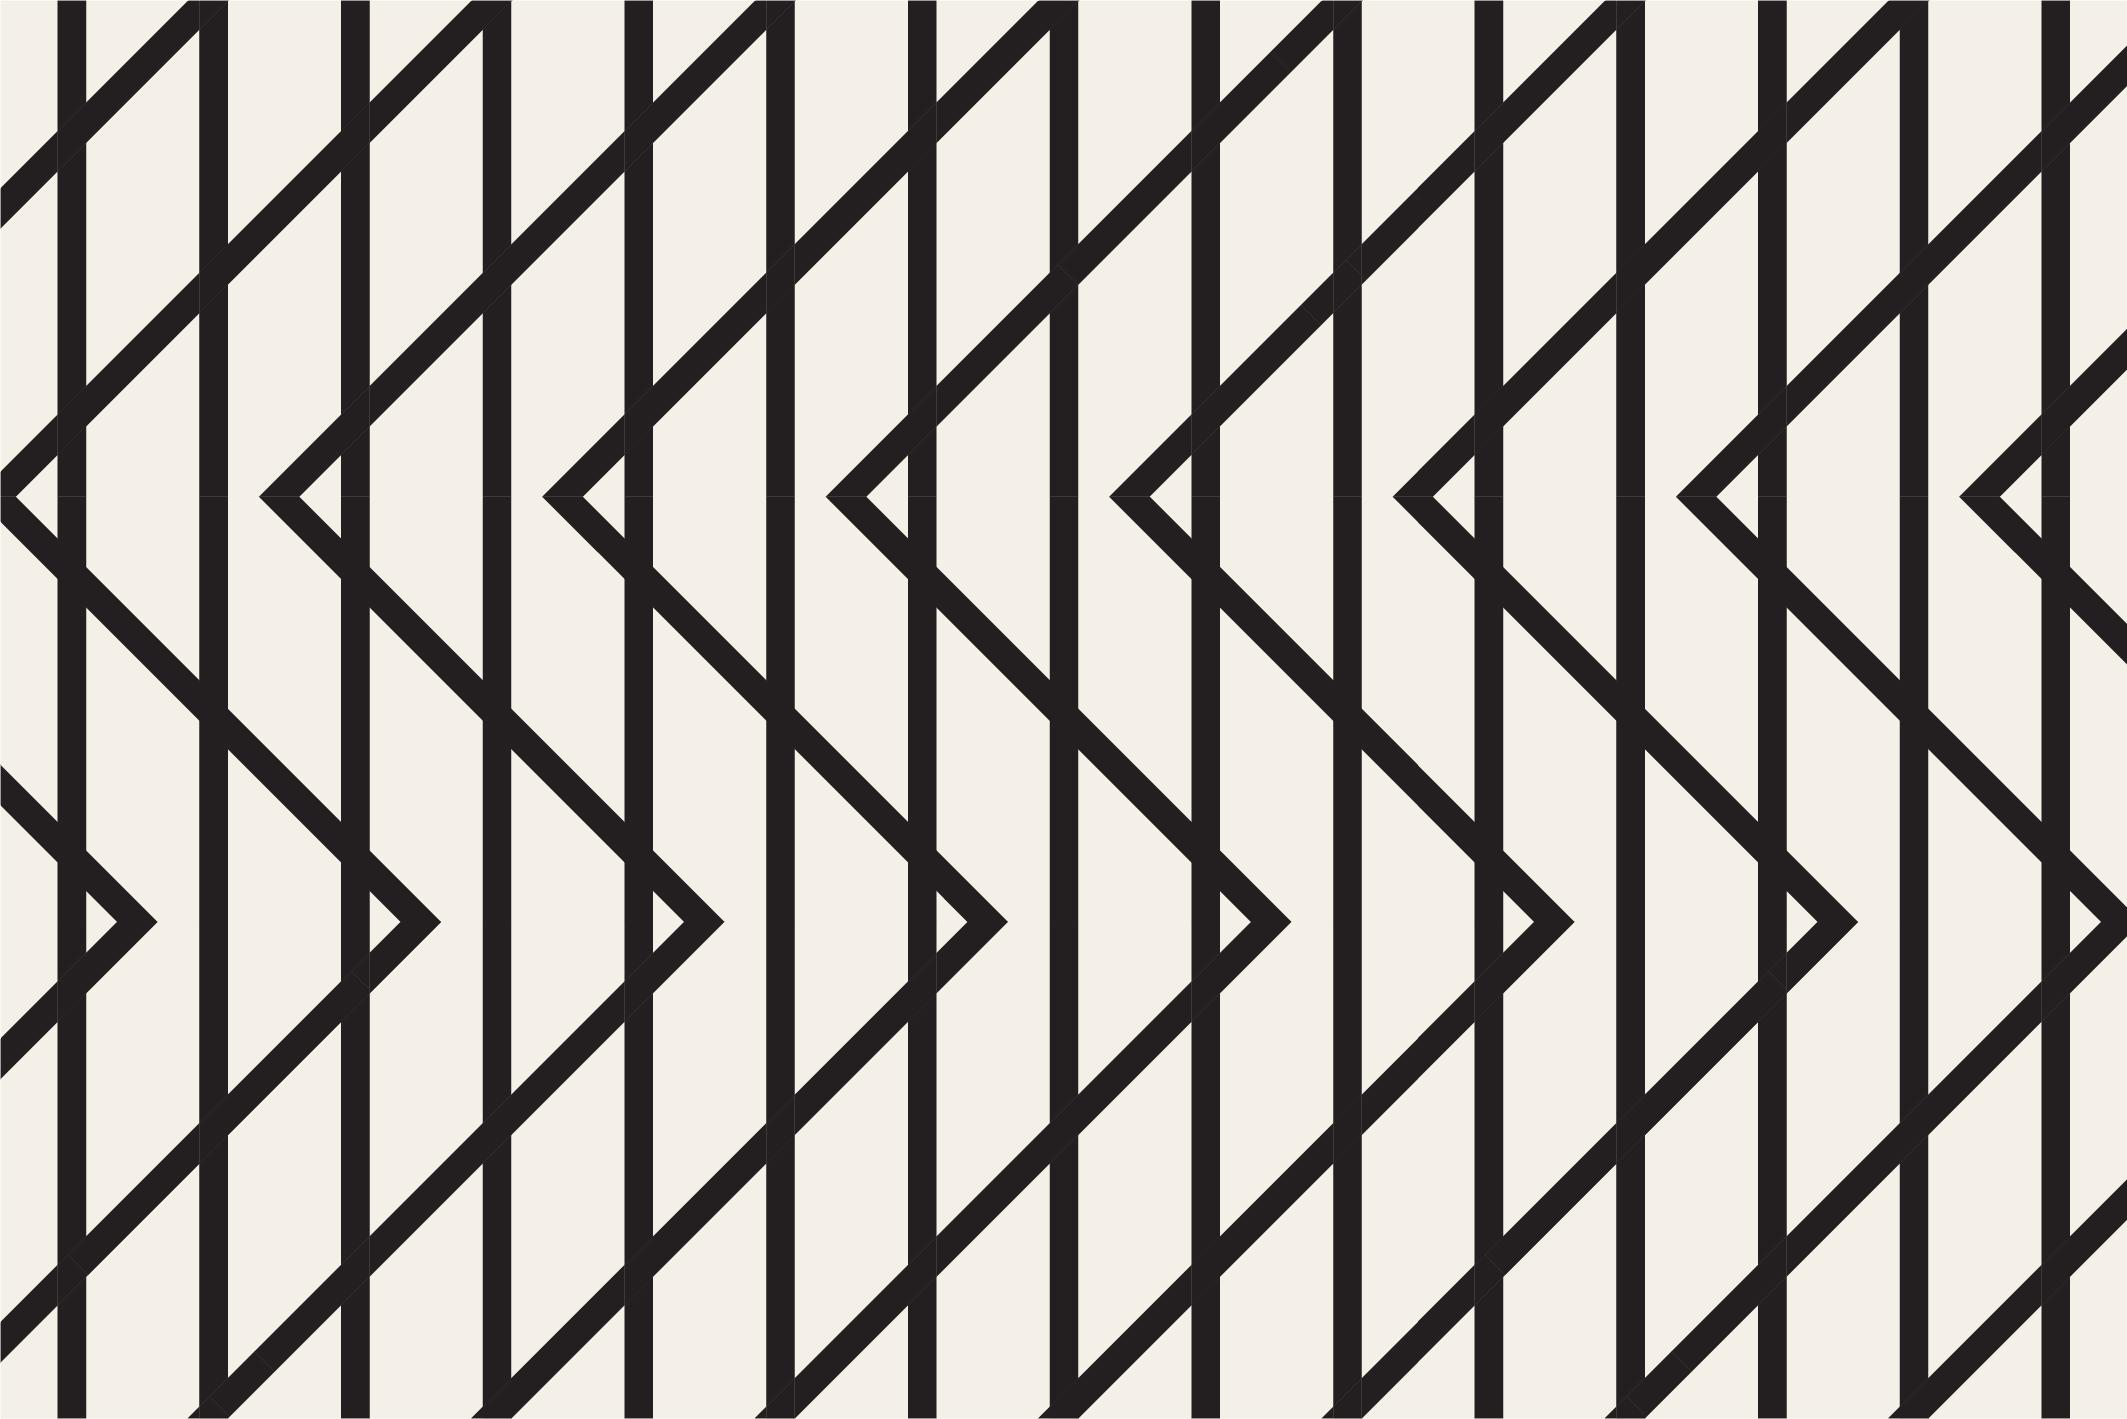 Geometric seamless patterns example image 5